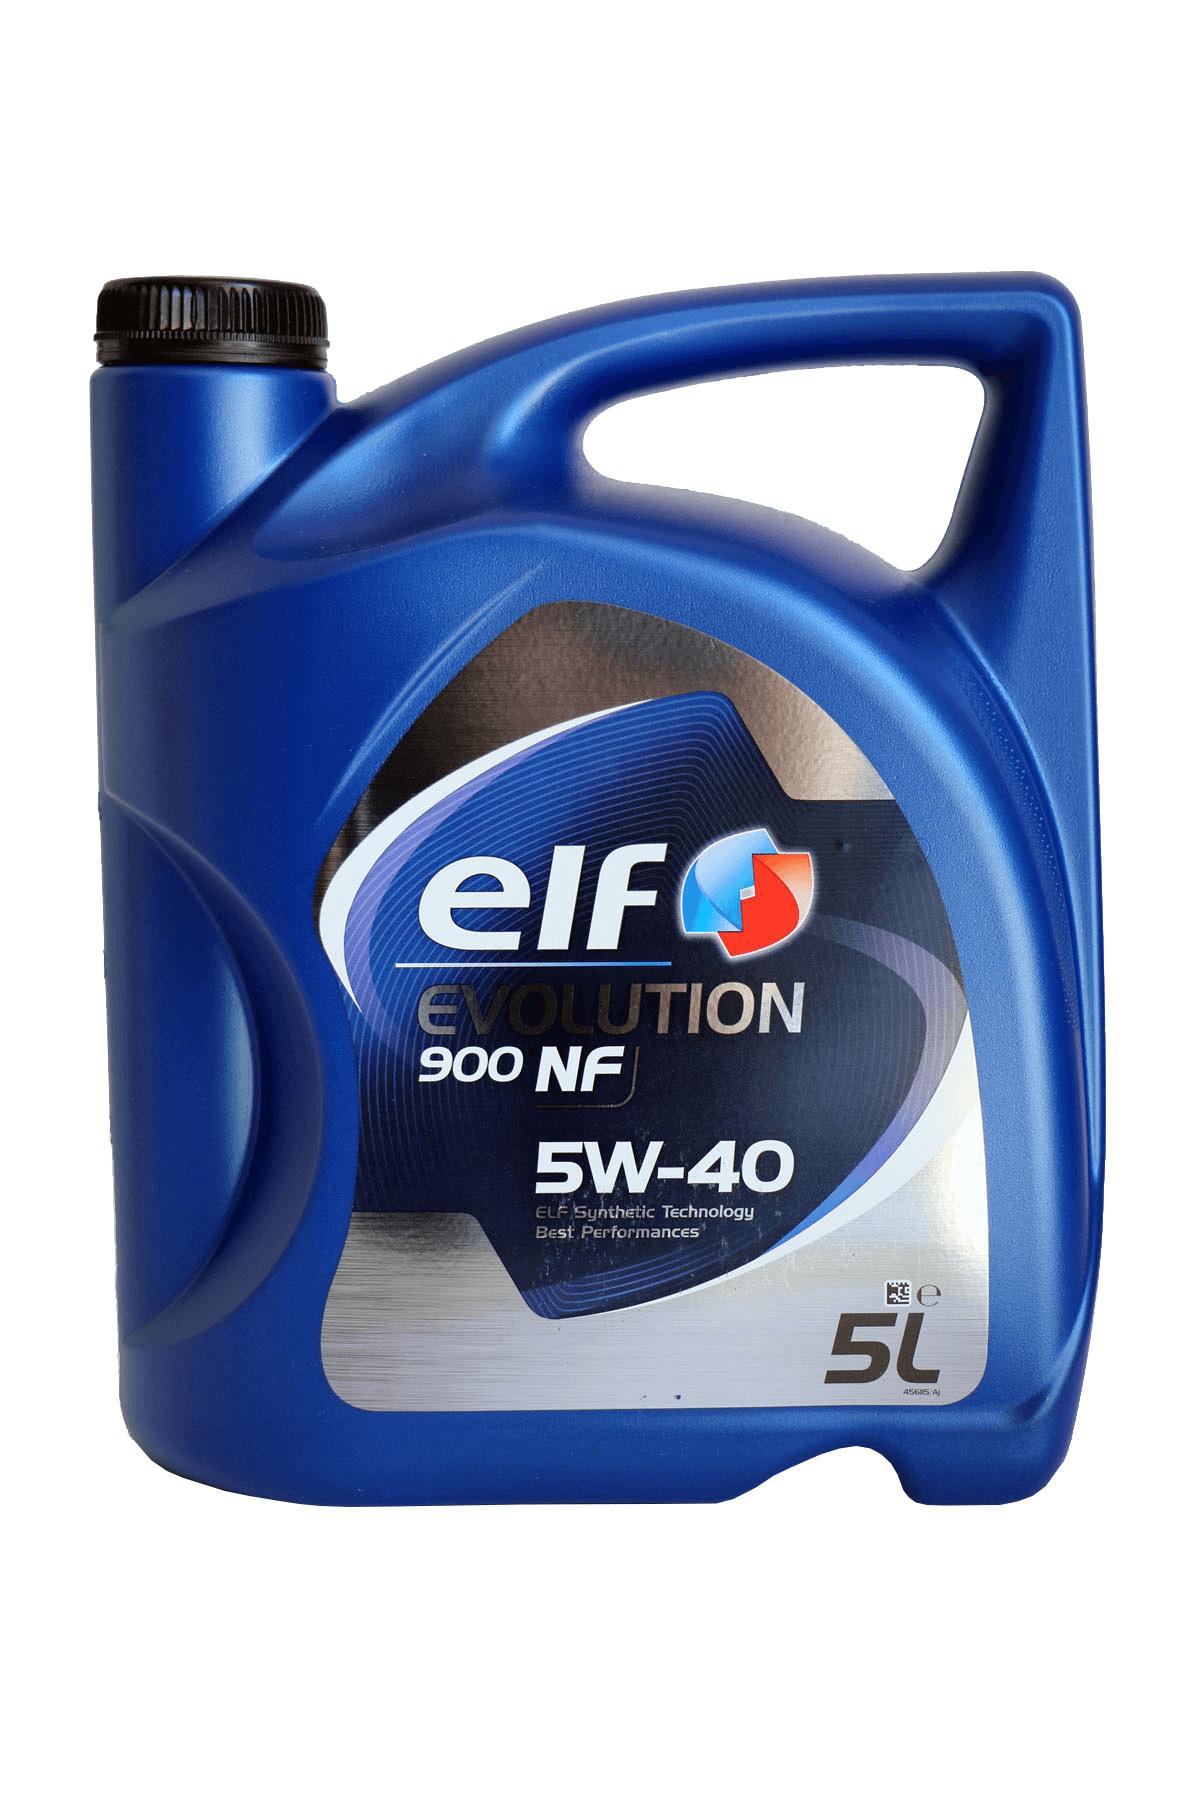 ELF Evolution 900 NF 5W-40 Motoröl, 5l